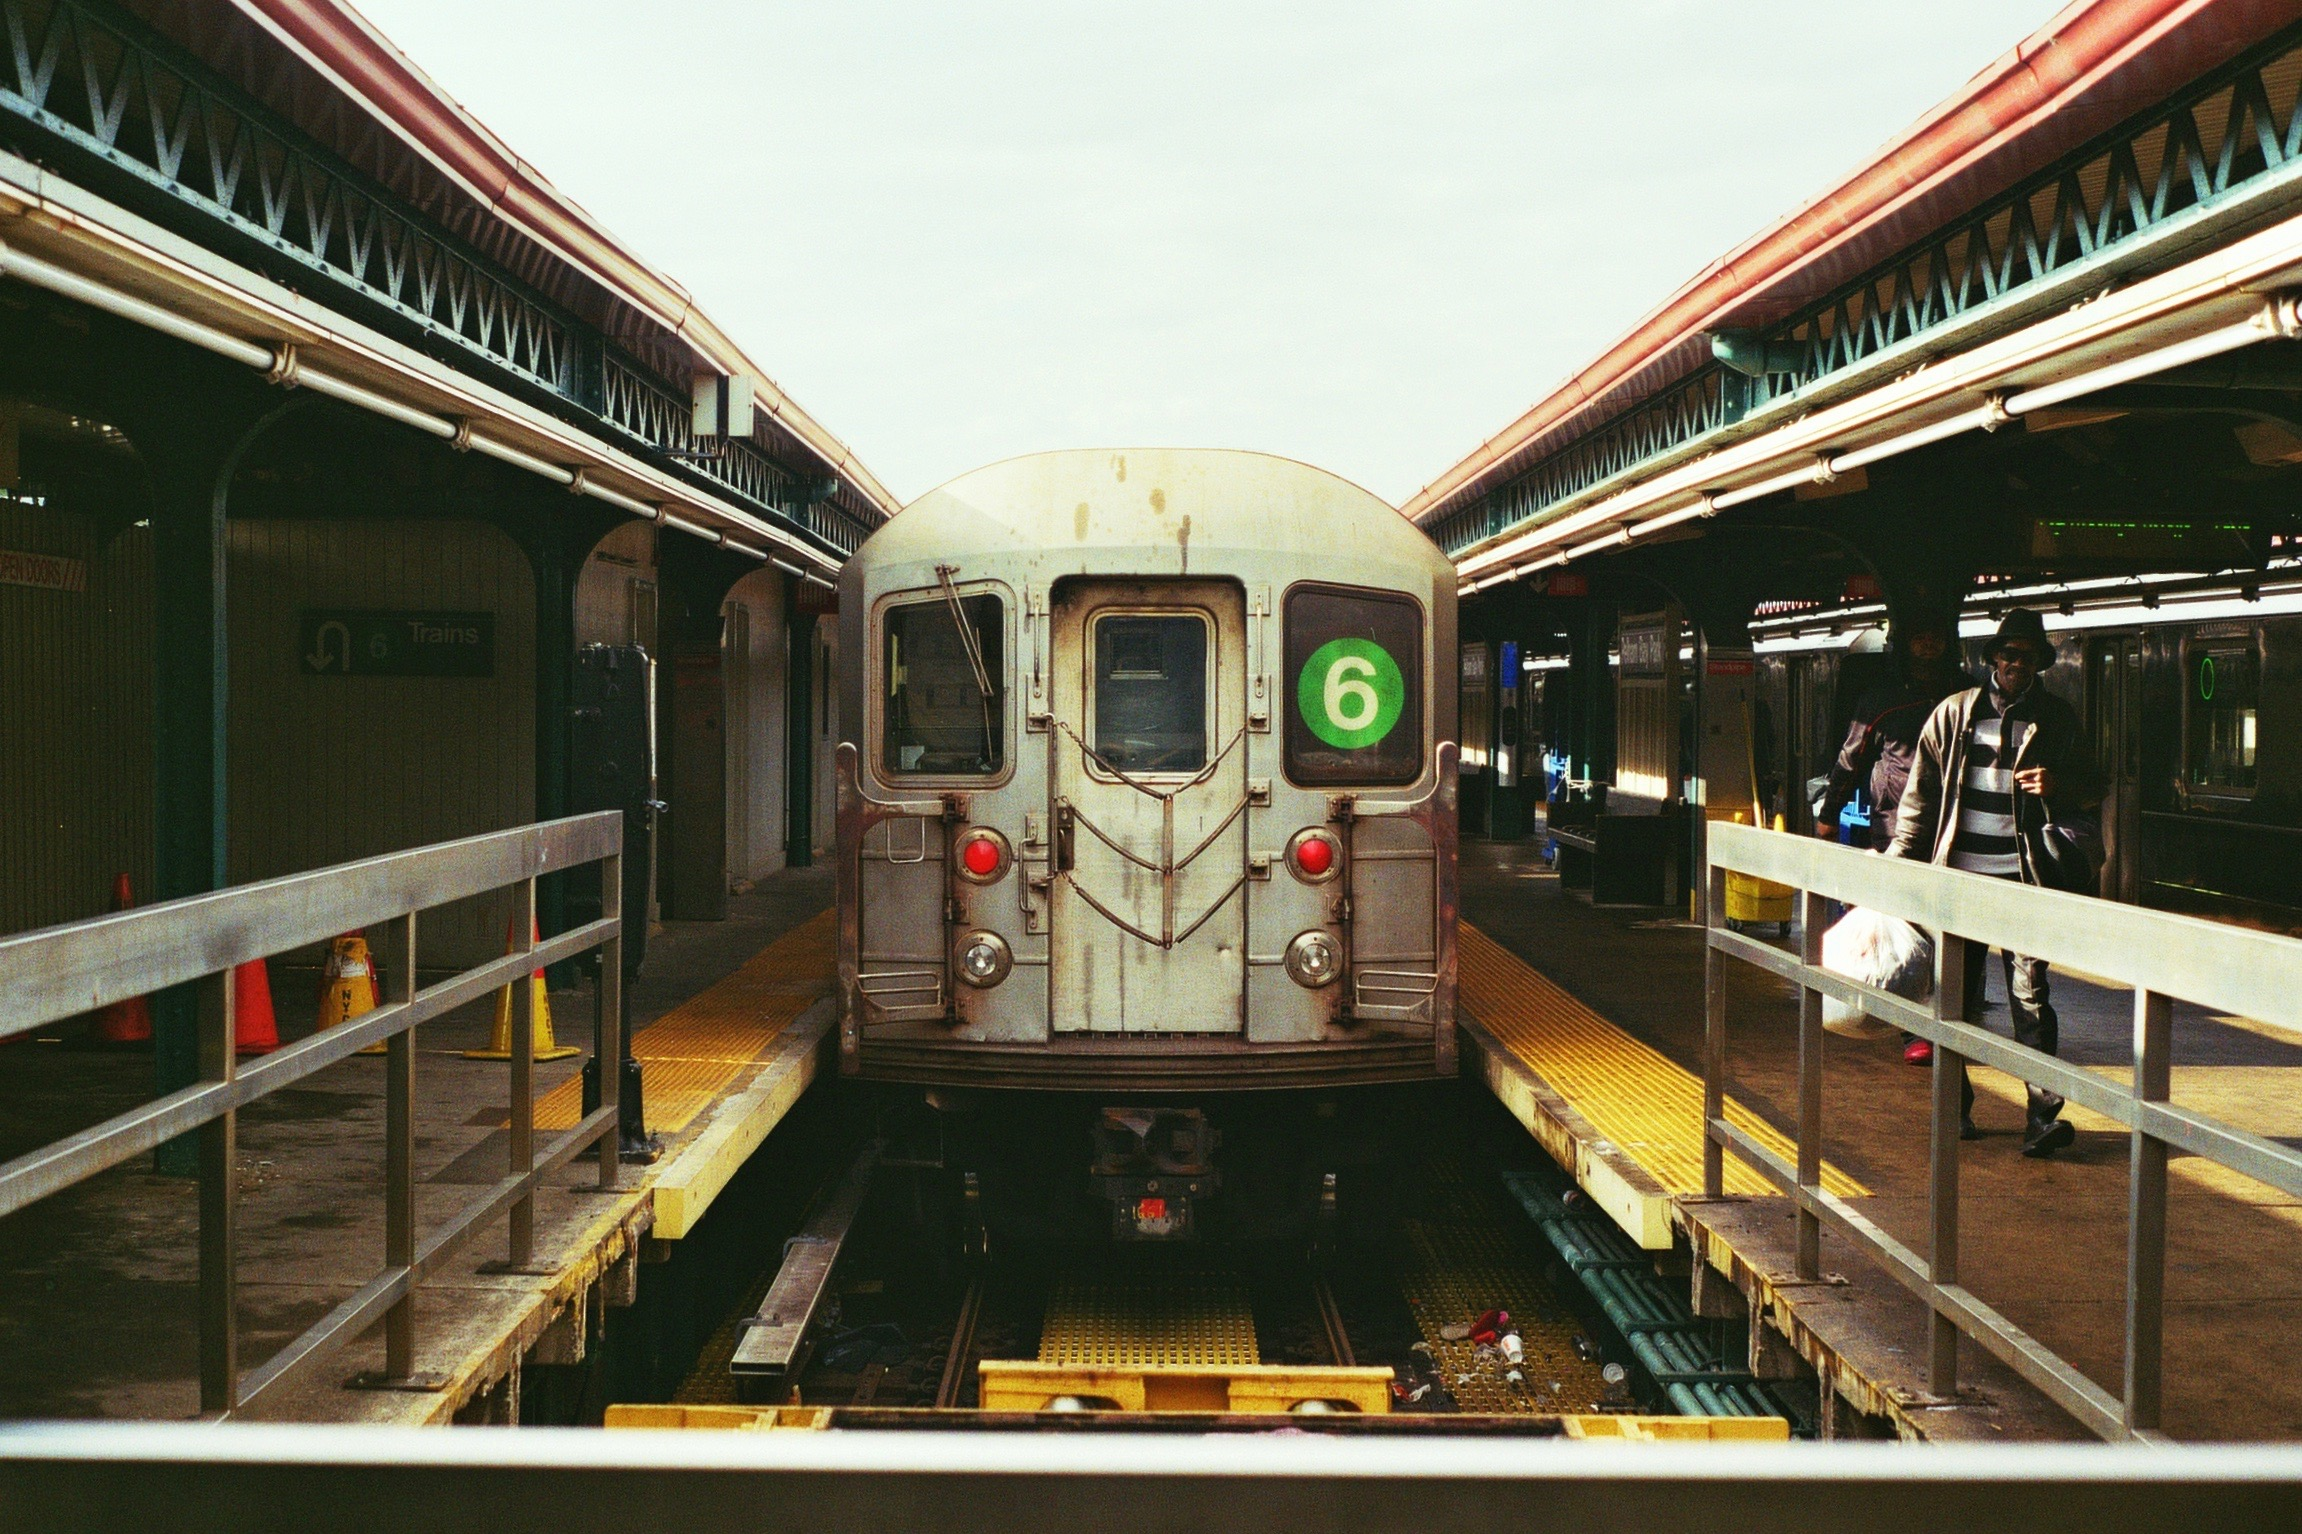 The end of the line. Pelham Bay Park Station, The Bronx.  Kodak Ultra Max 400. Pentax K1000. Fletcher Berryman 2019.